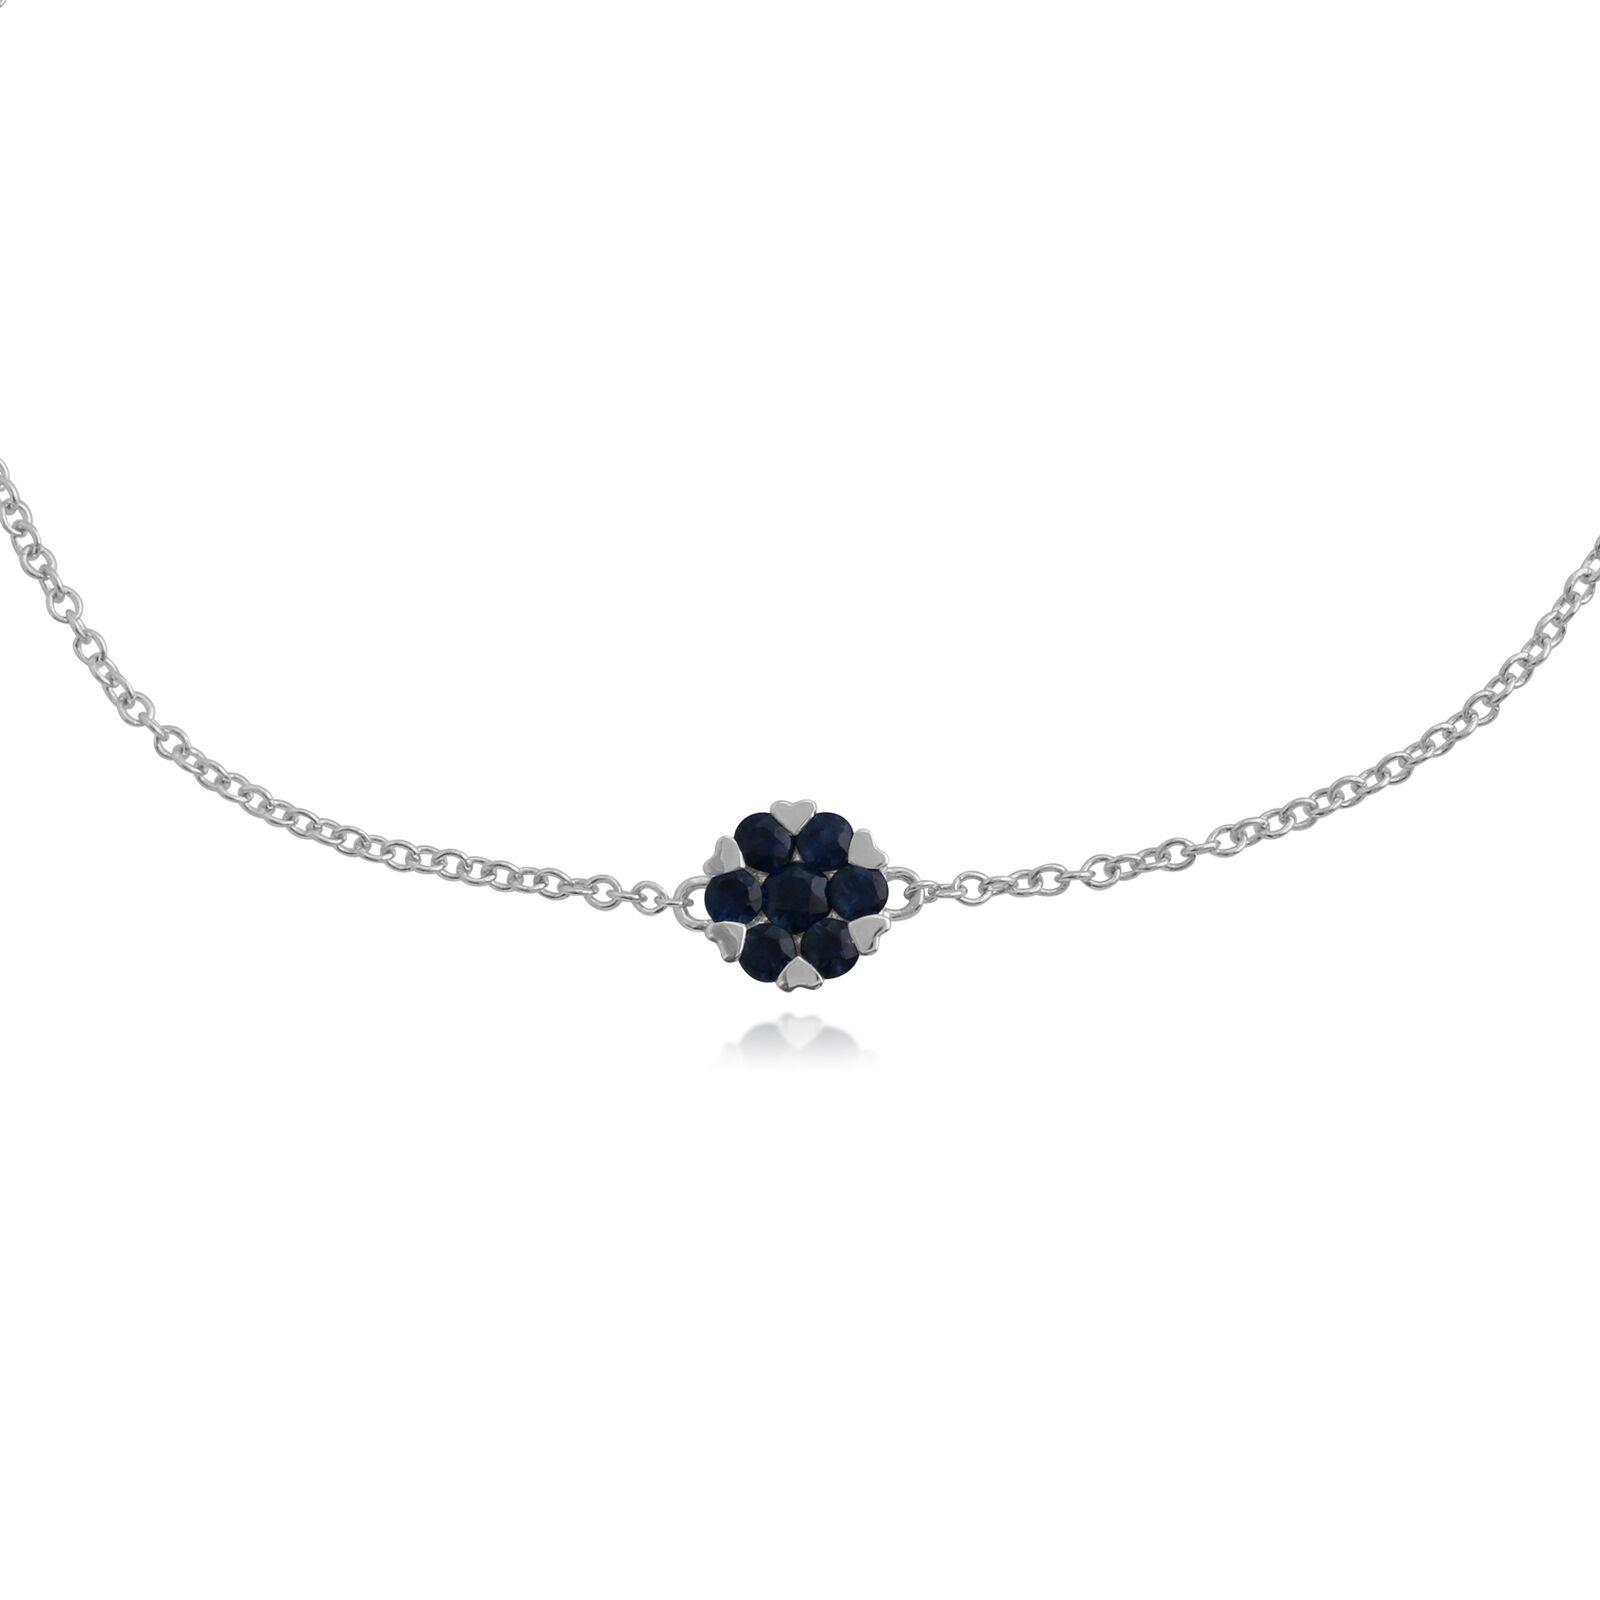 Gemondo 9ct White gold 0.39ct Sapphire Floral Cluster 19cm Bracelet